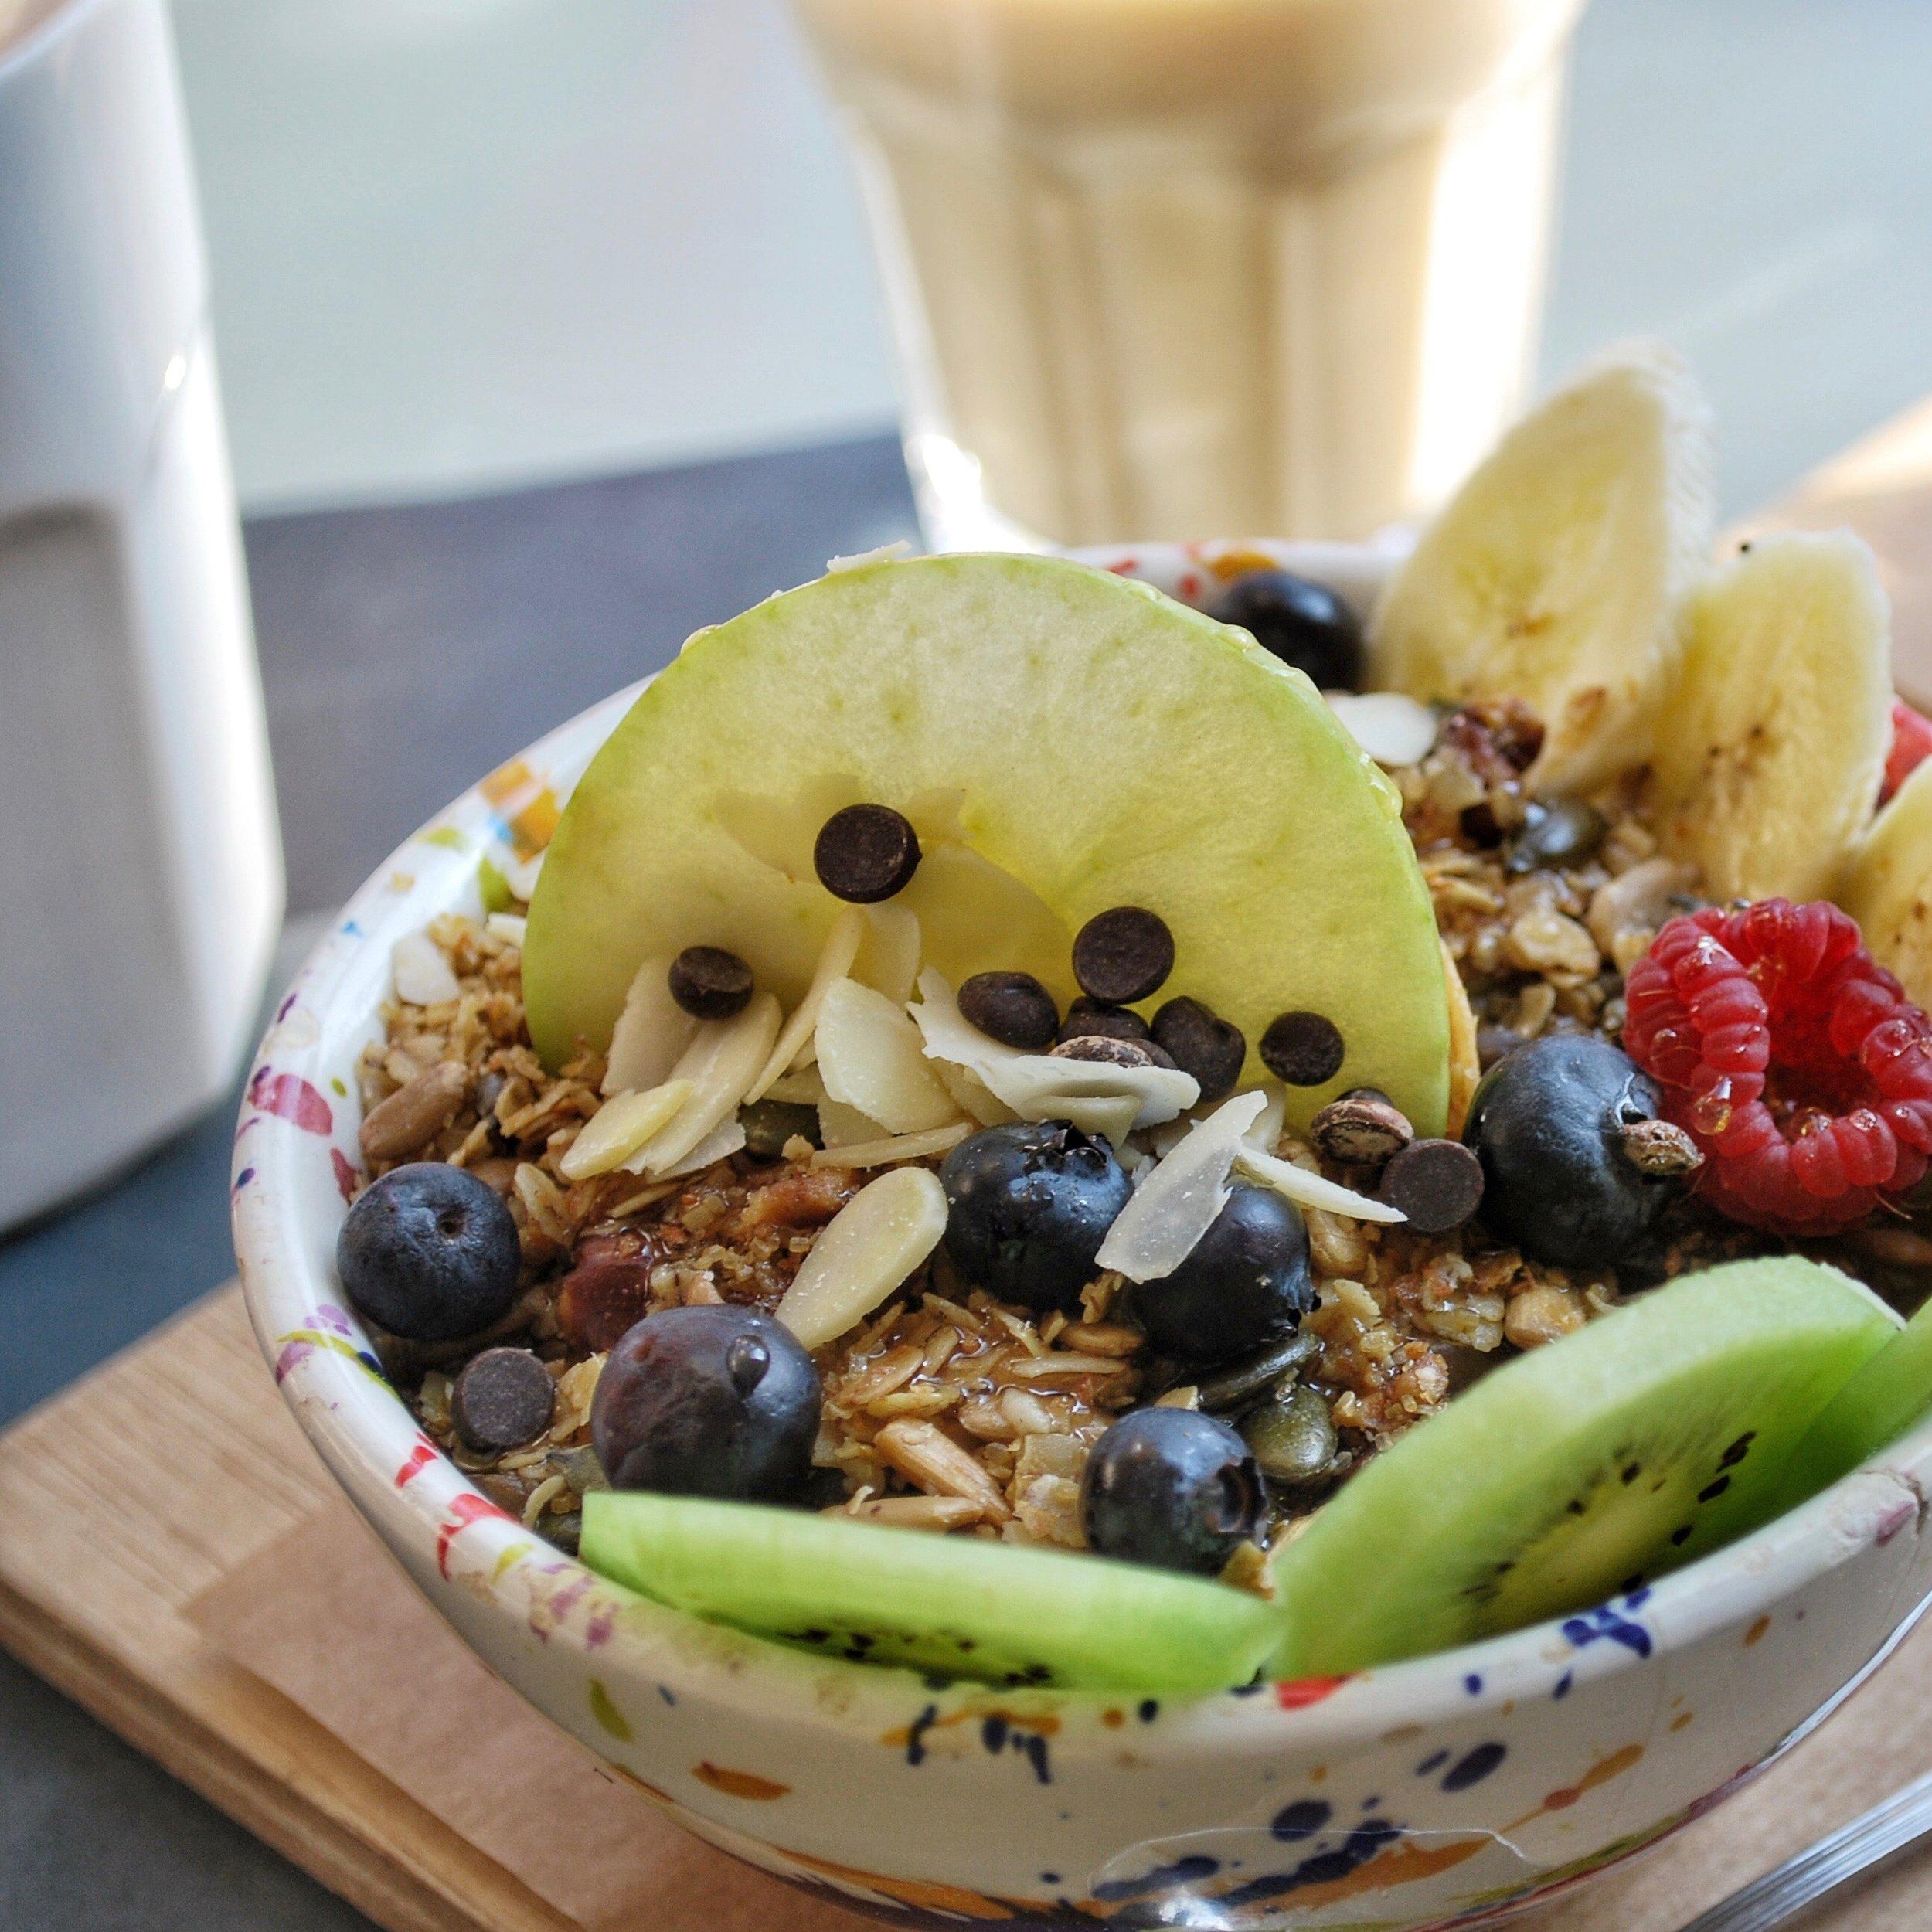 Vegan Soyjoghurt with Granola